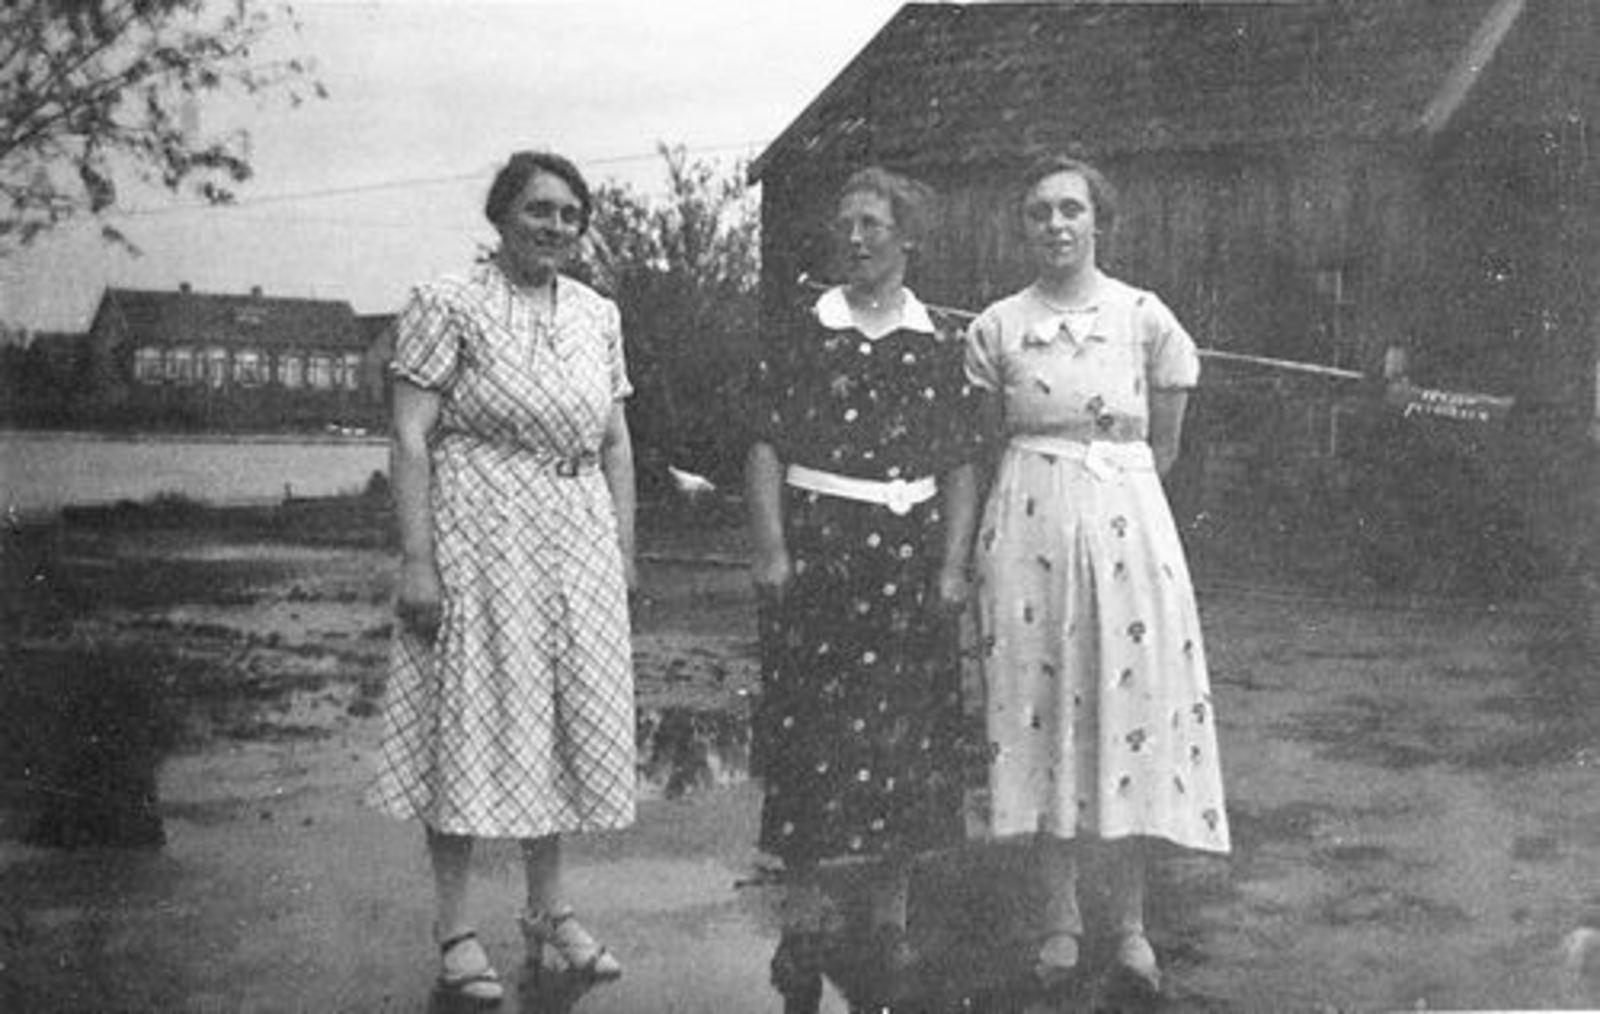 <b>ZOEKPLAATJE:</b>Elshout Hendrika 1921 19__ met Onbekend op Erf